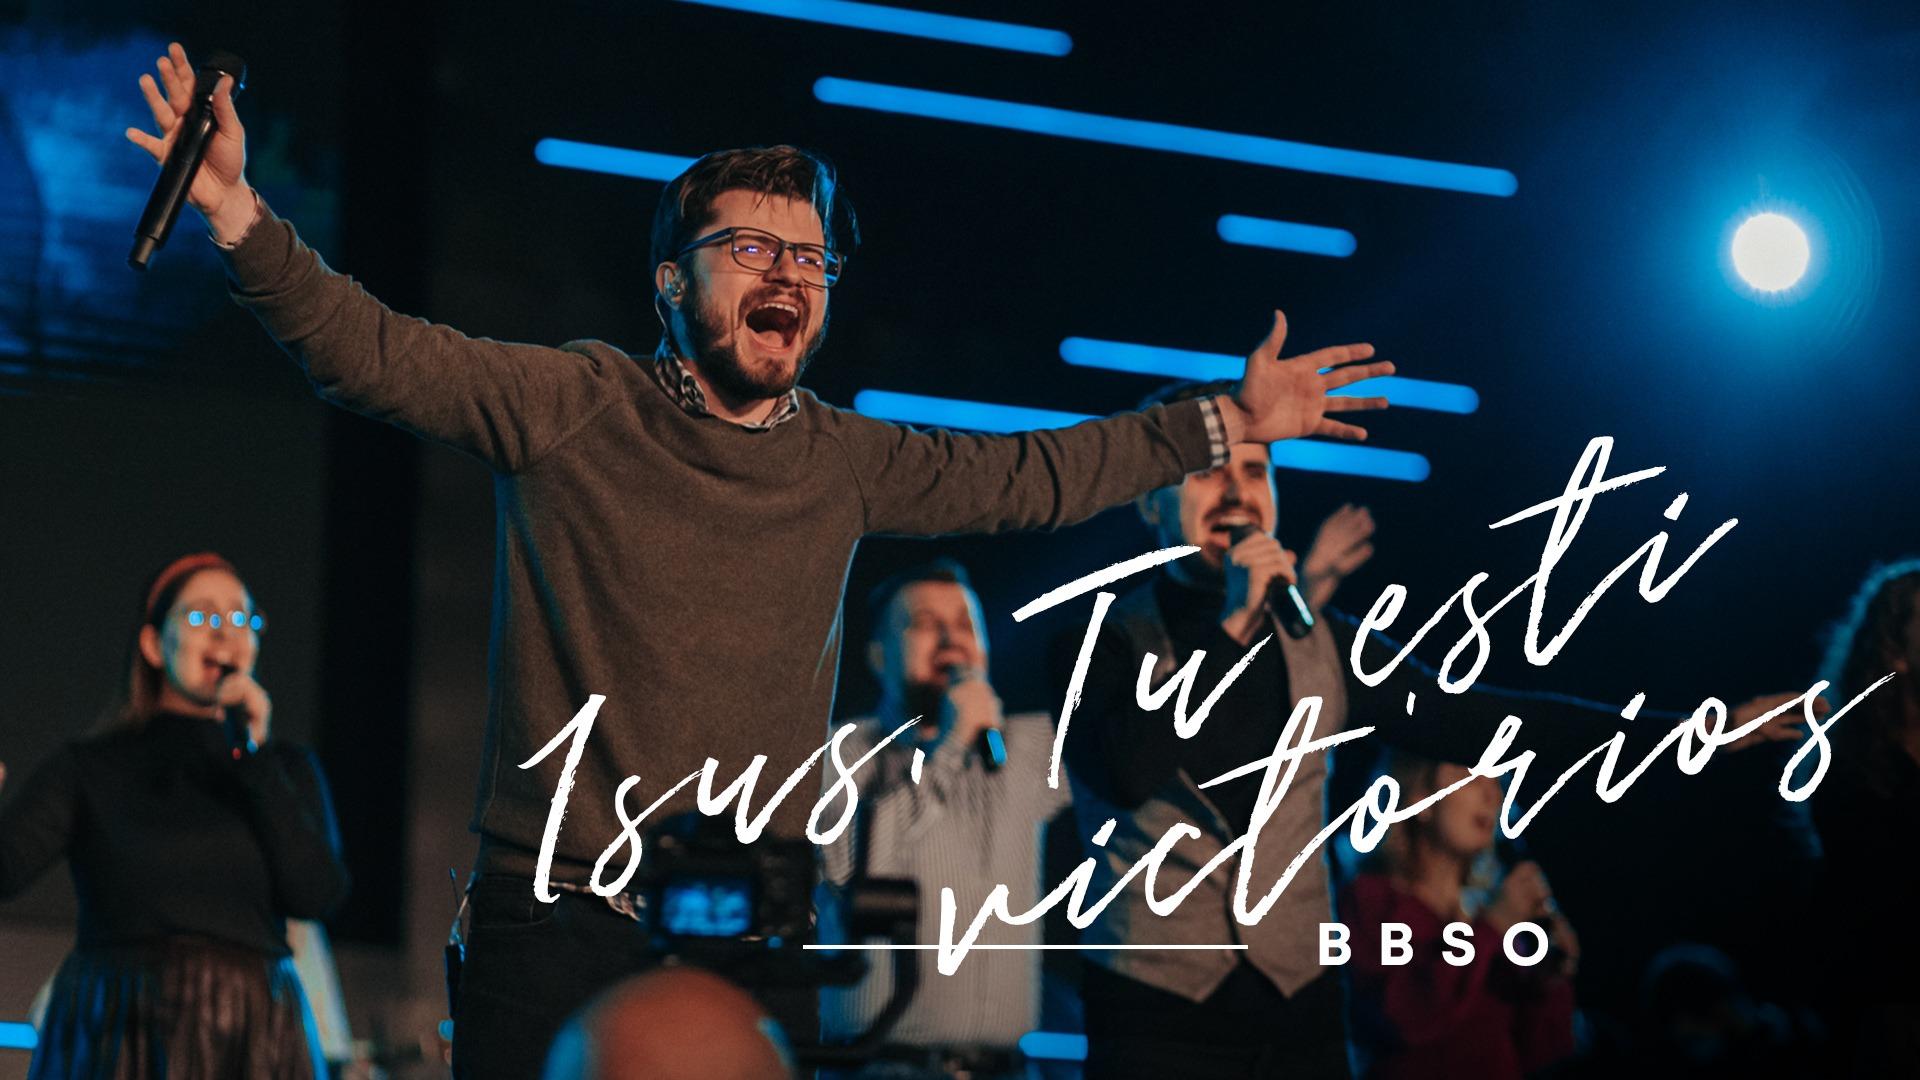 Isus, Tu ești victorios